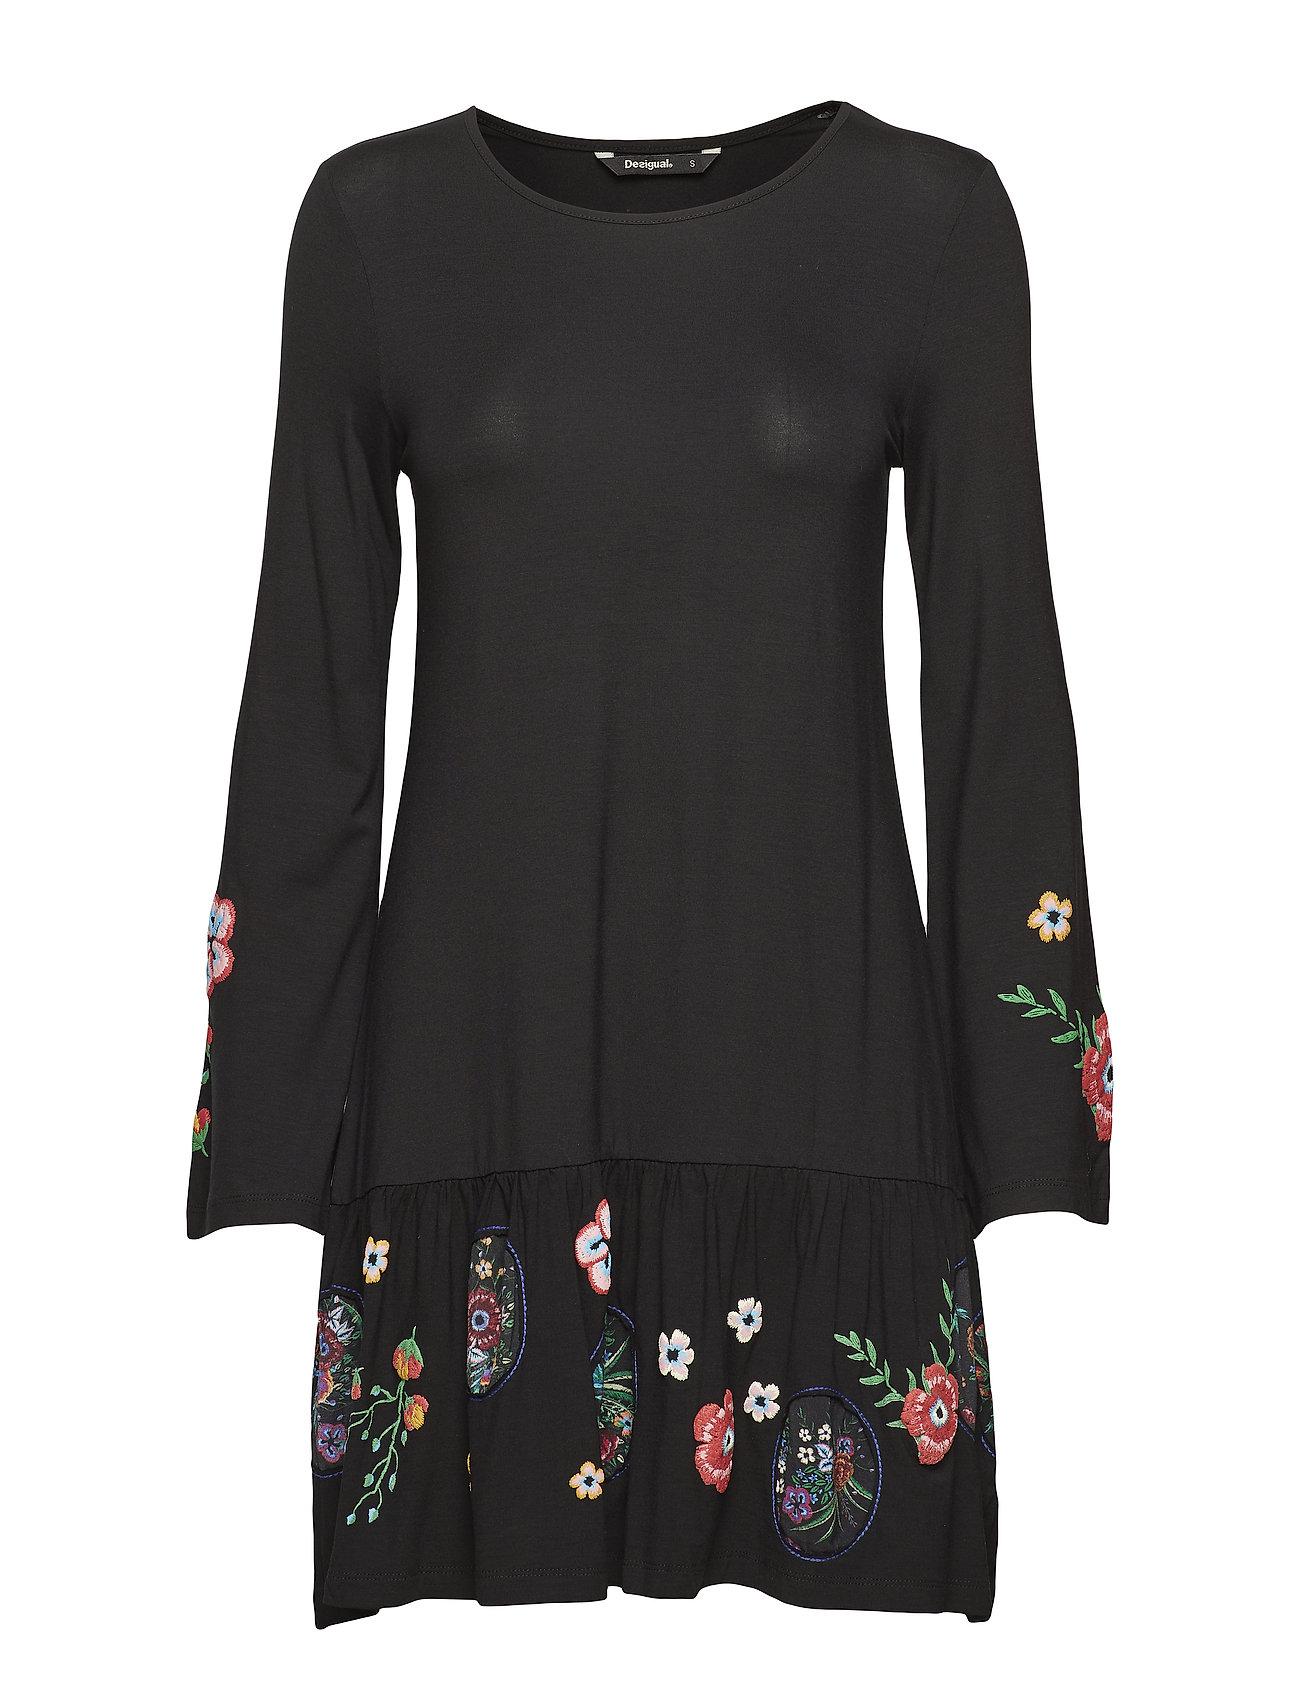 Vest Surat (Negro) (£41.40) - Desigual -  979b9ed45b5